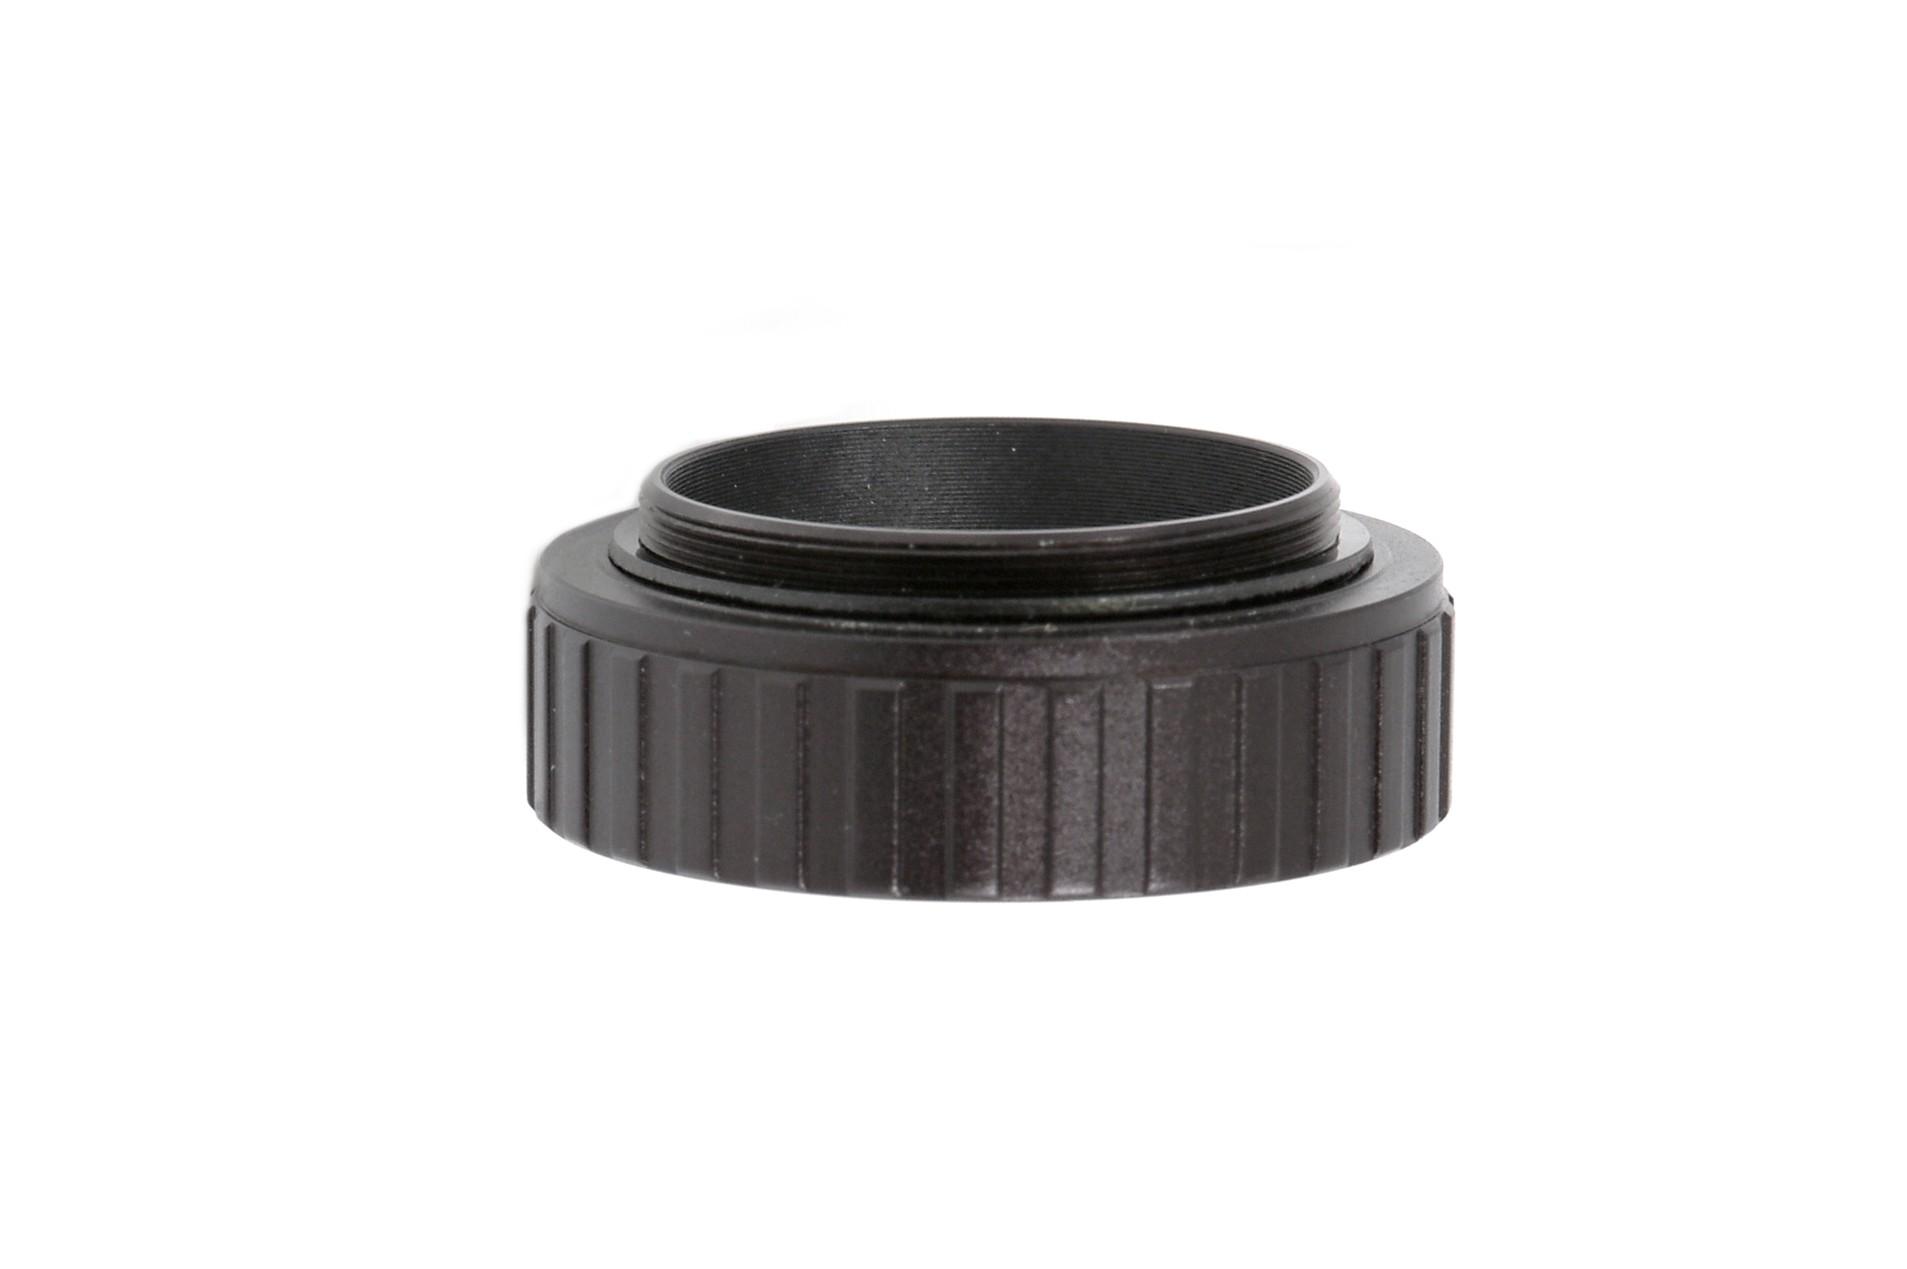 Baader SC / HD Ultra Short T-Adaptor, 7mm optical length